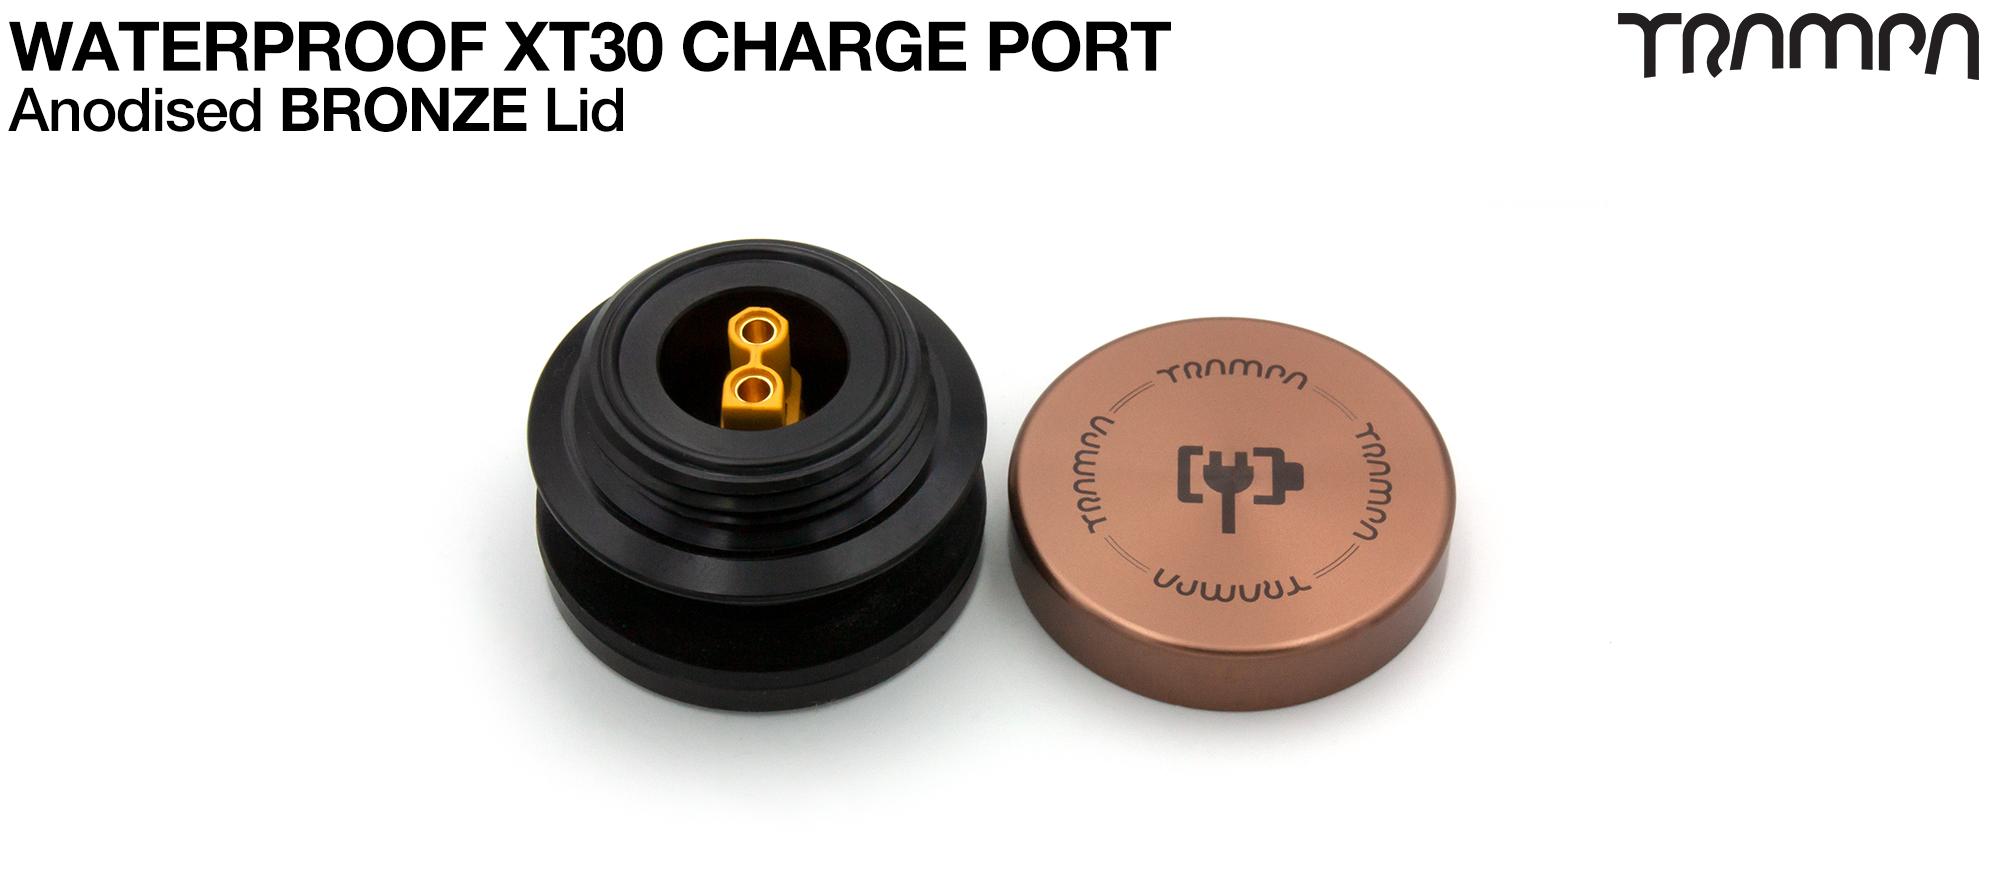 ORRSOM GT XT30 WATERPROOF Charge Port - BRONZE